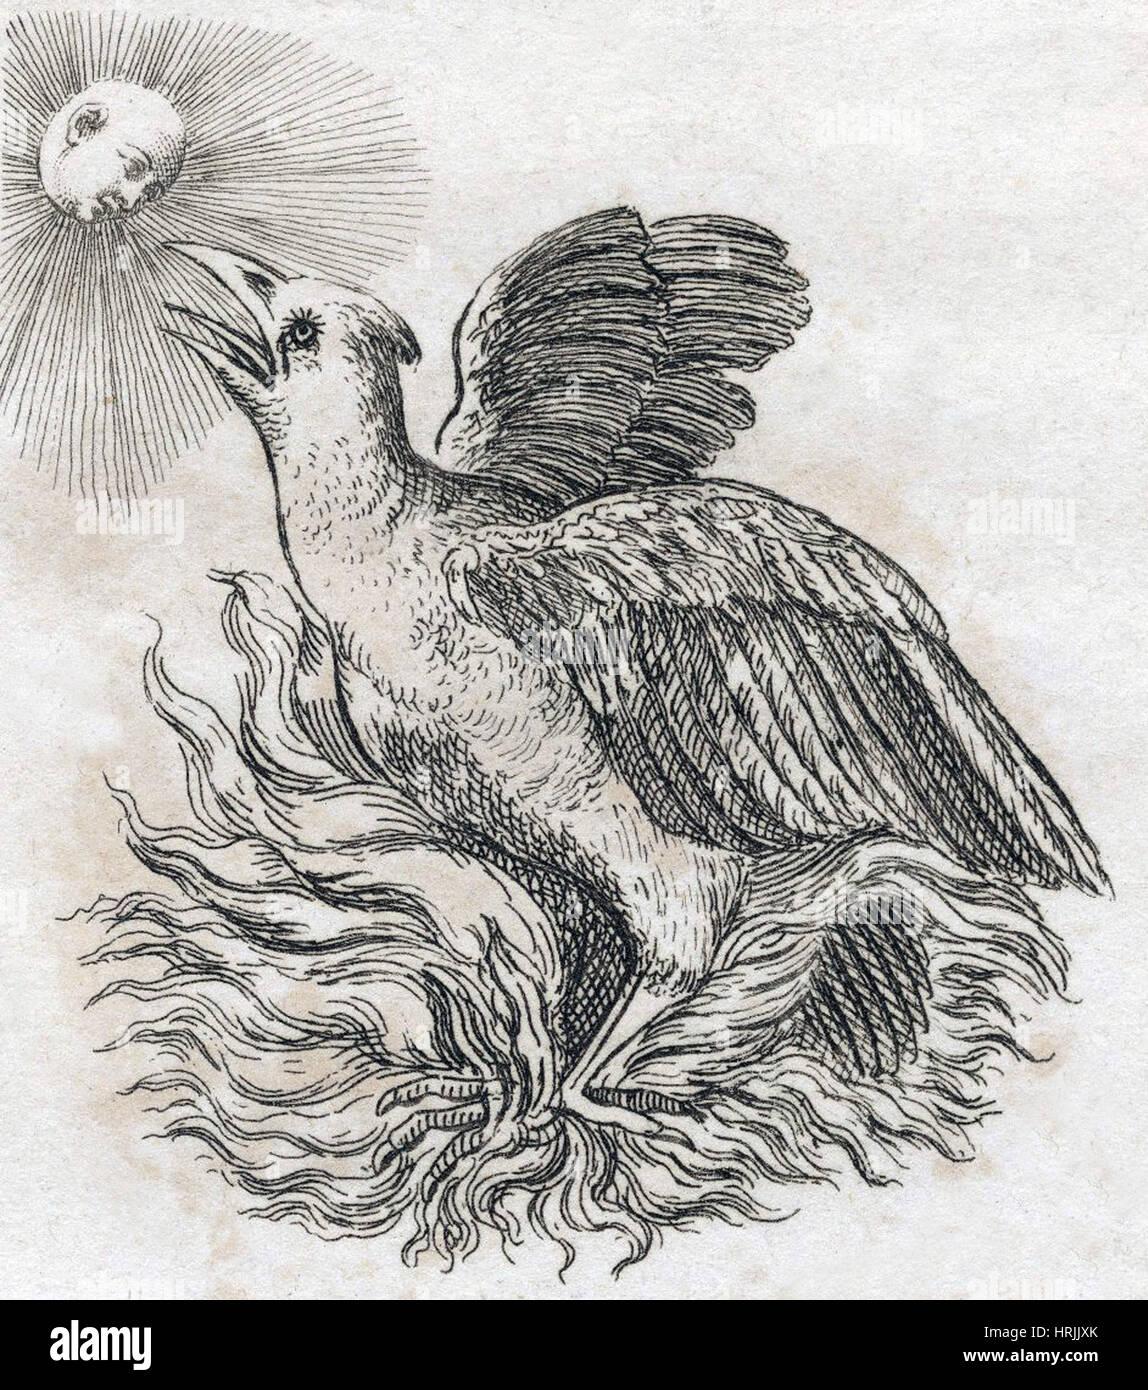 Phoenix, legendäre Kreatur Stockbild